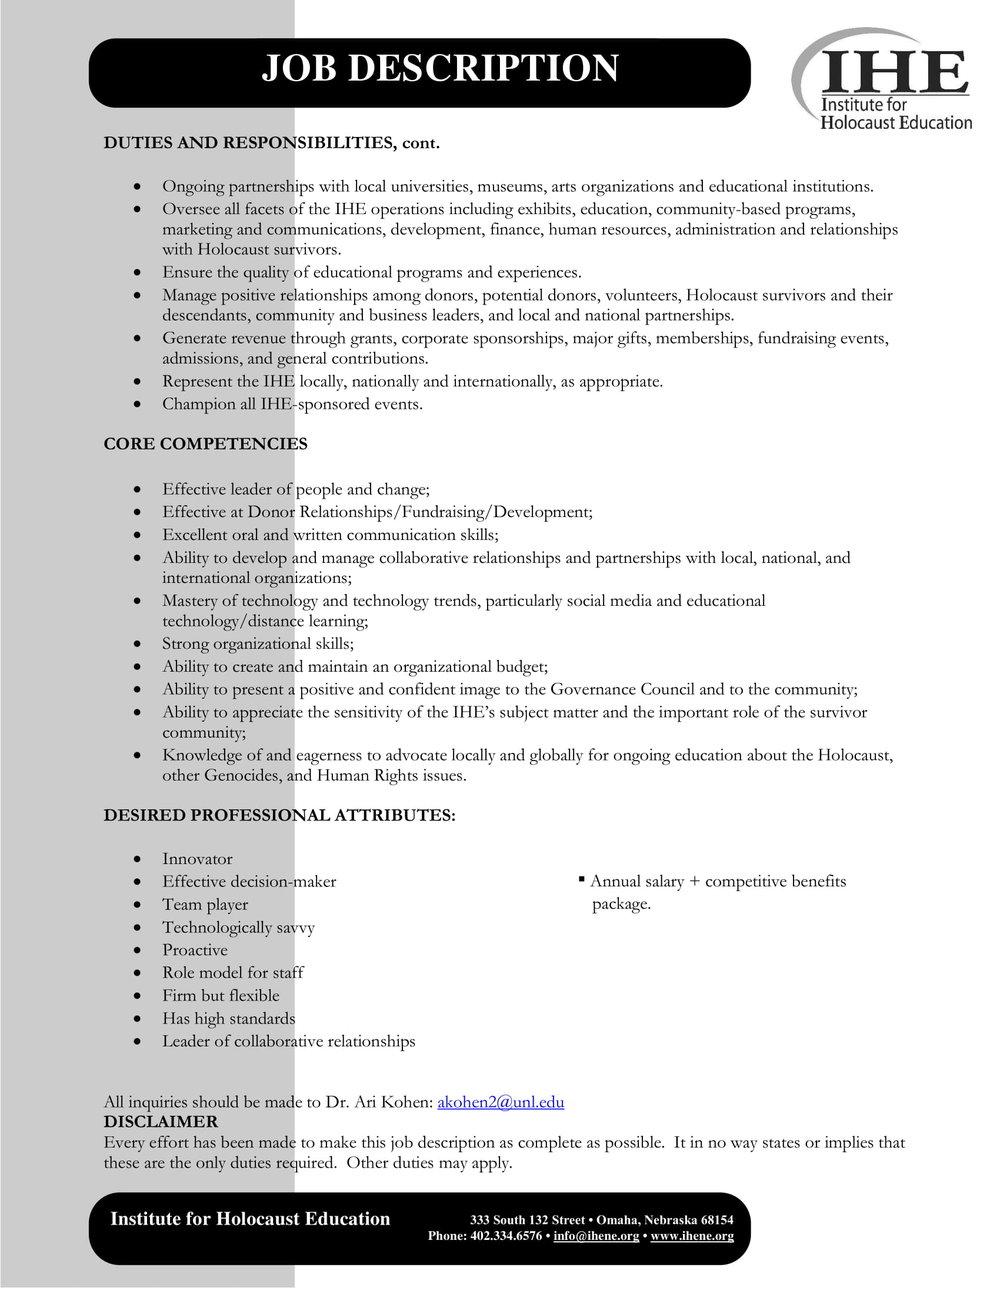 IHE Executive Director.job description-2.jpg